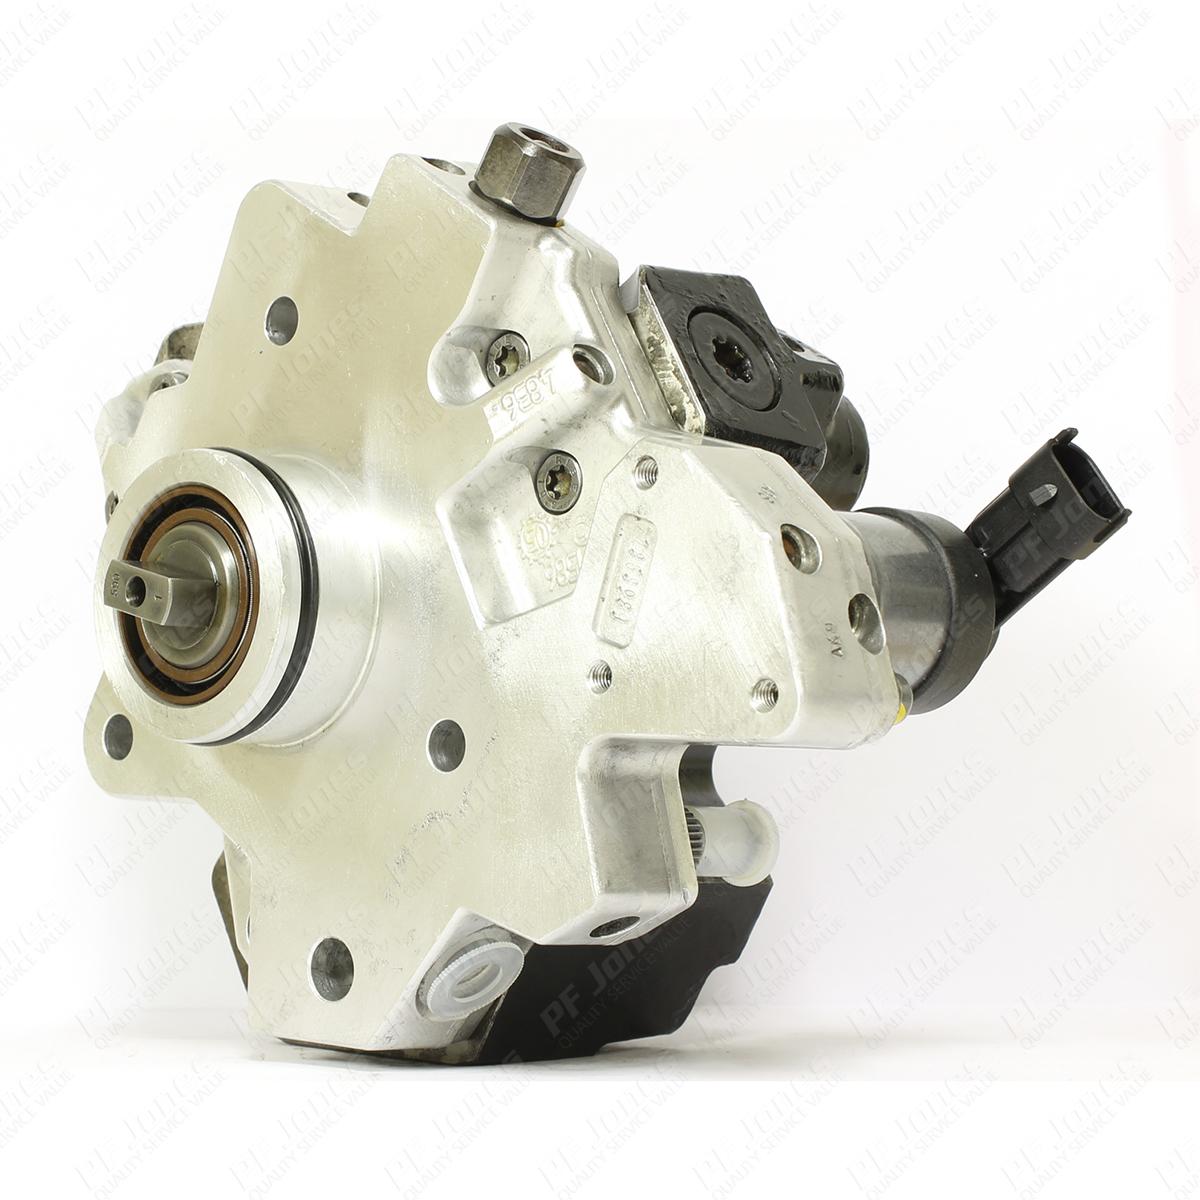 Hyundai I30 2 0 Crdi 2007 2011 Reconditioned Bosch Diesel Fuel Pump 0445010121